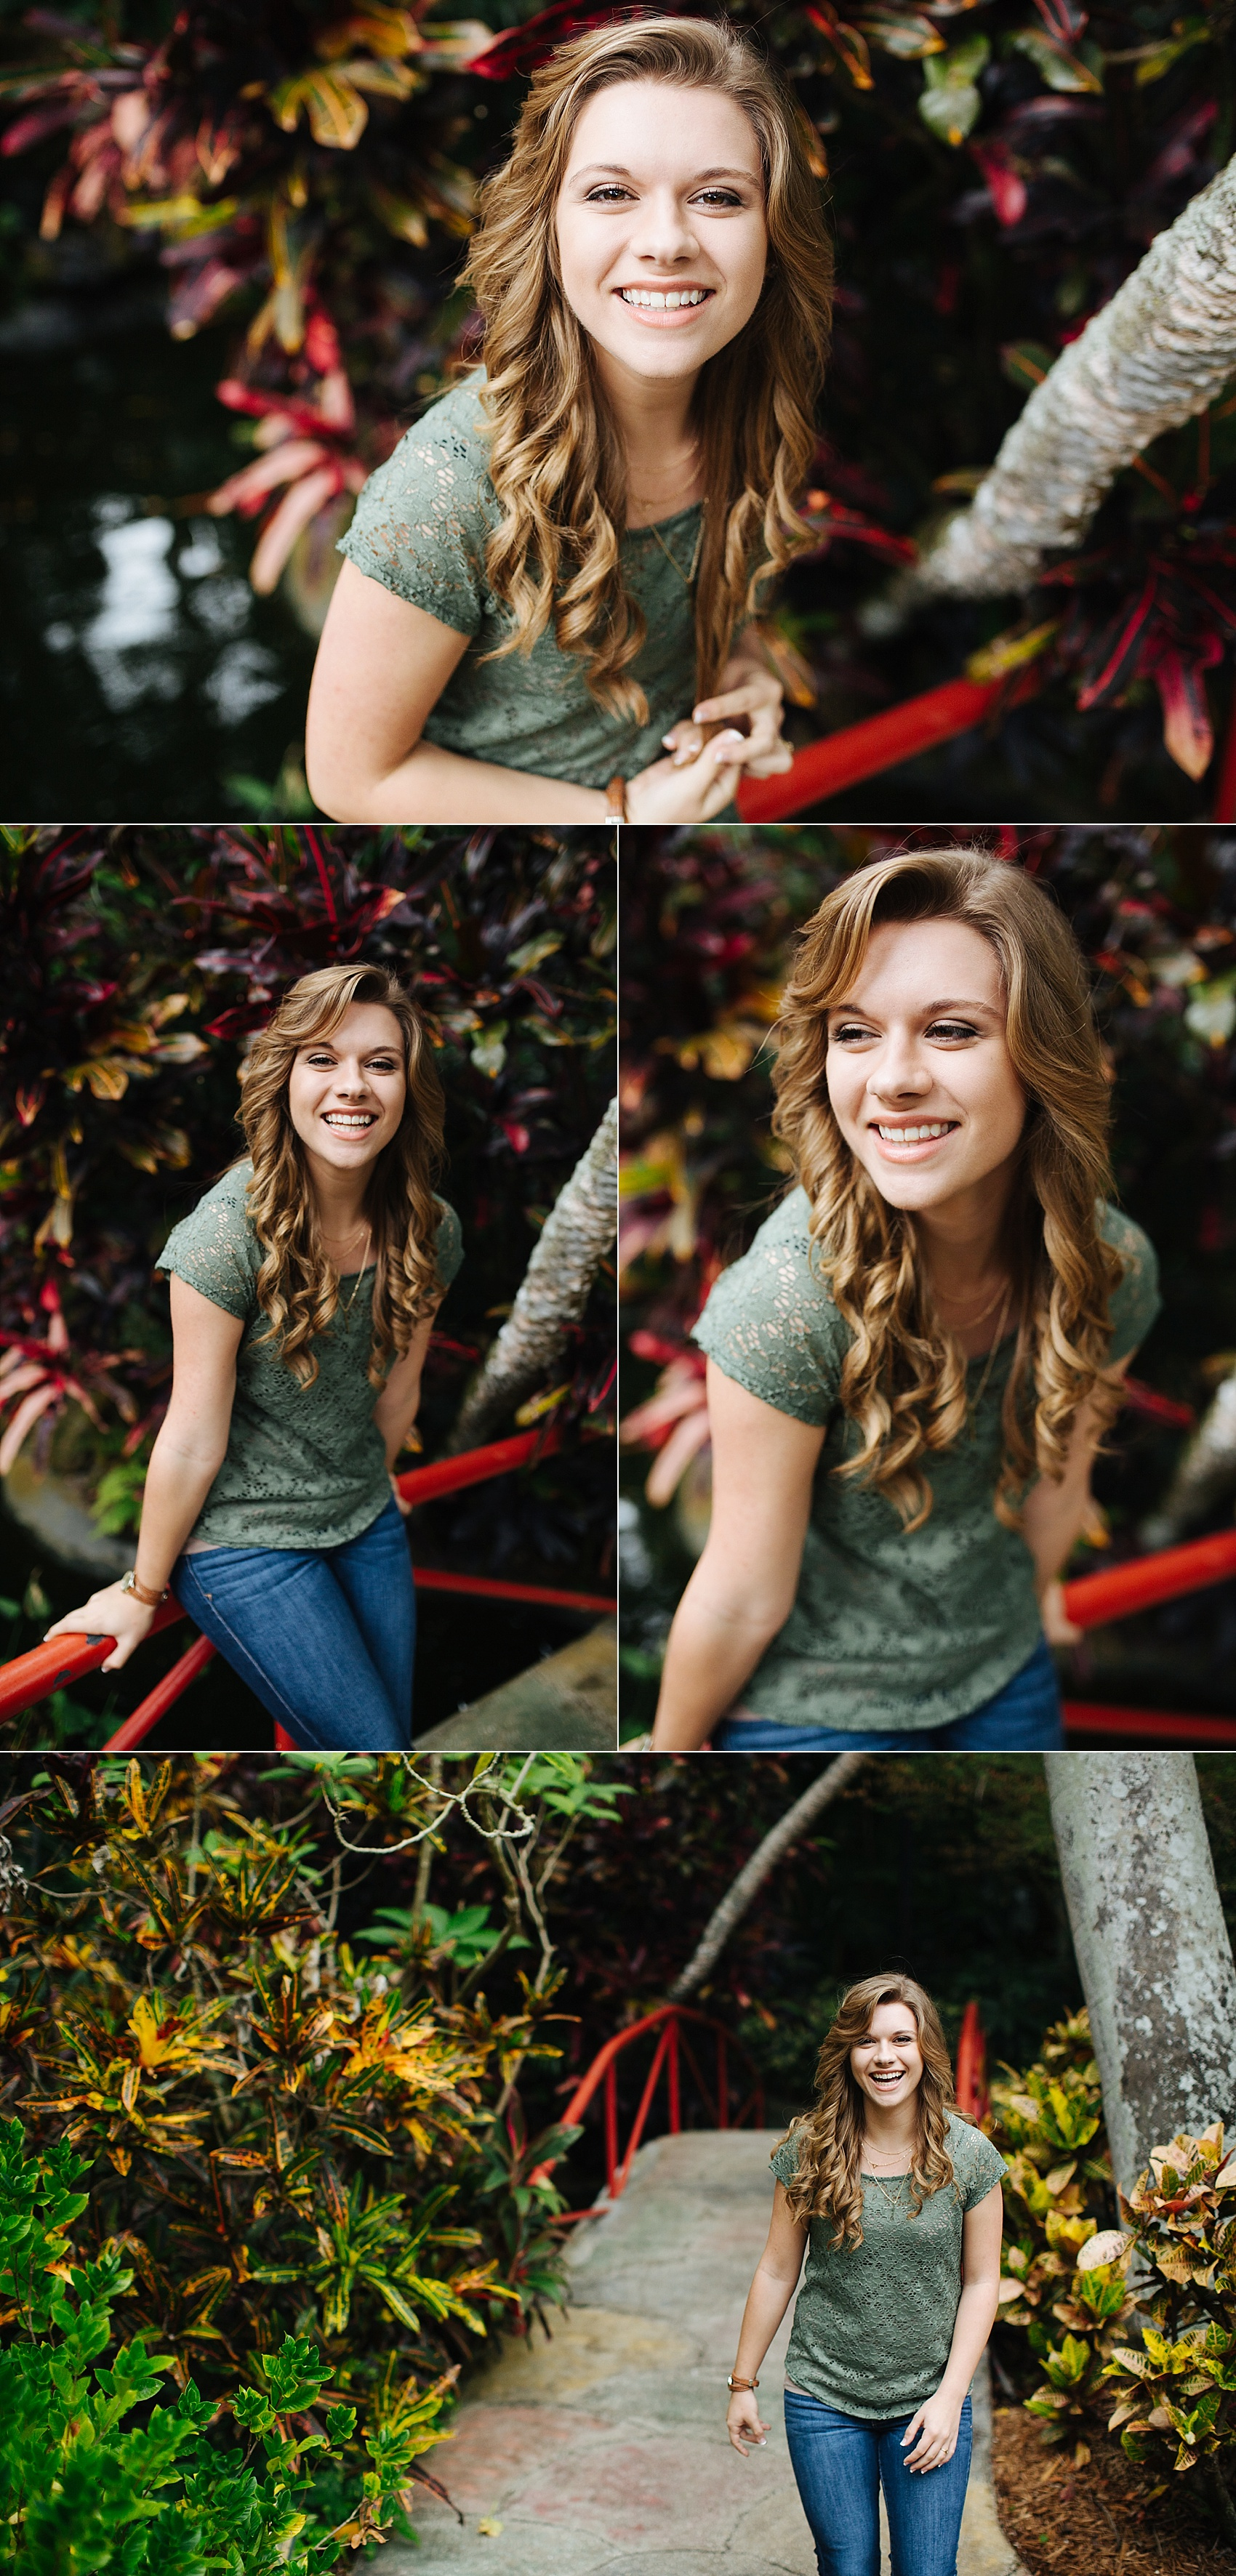 stpete senior portraits sunken gardens leah-2